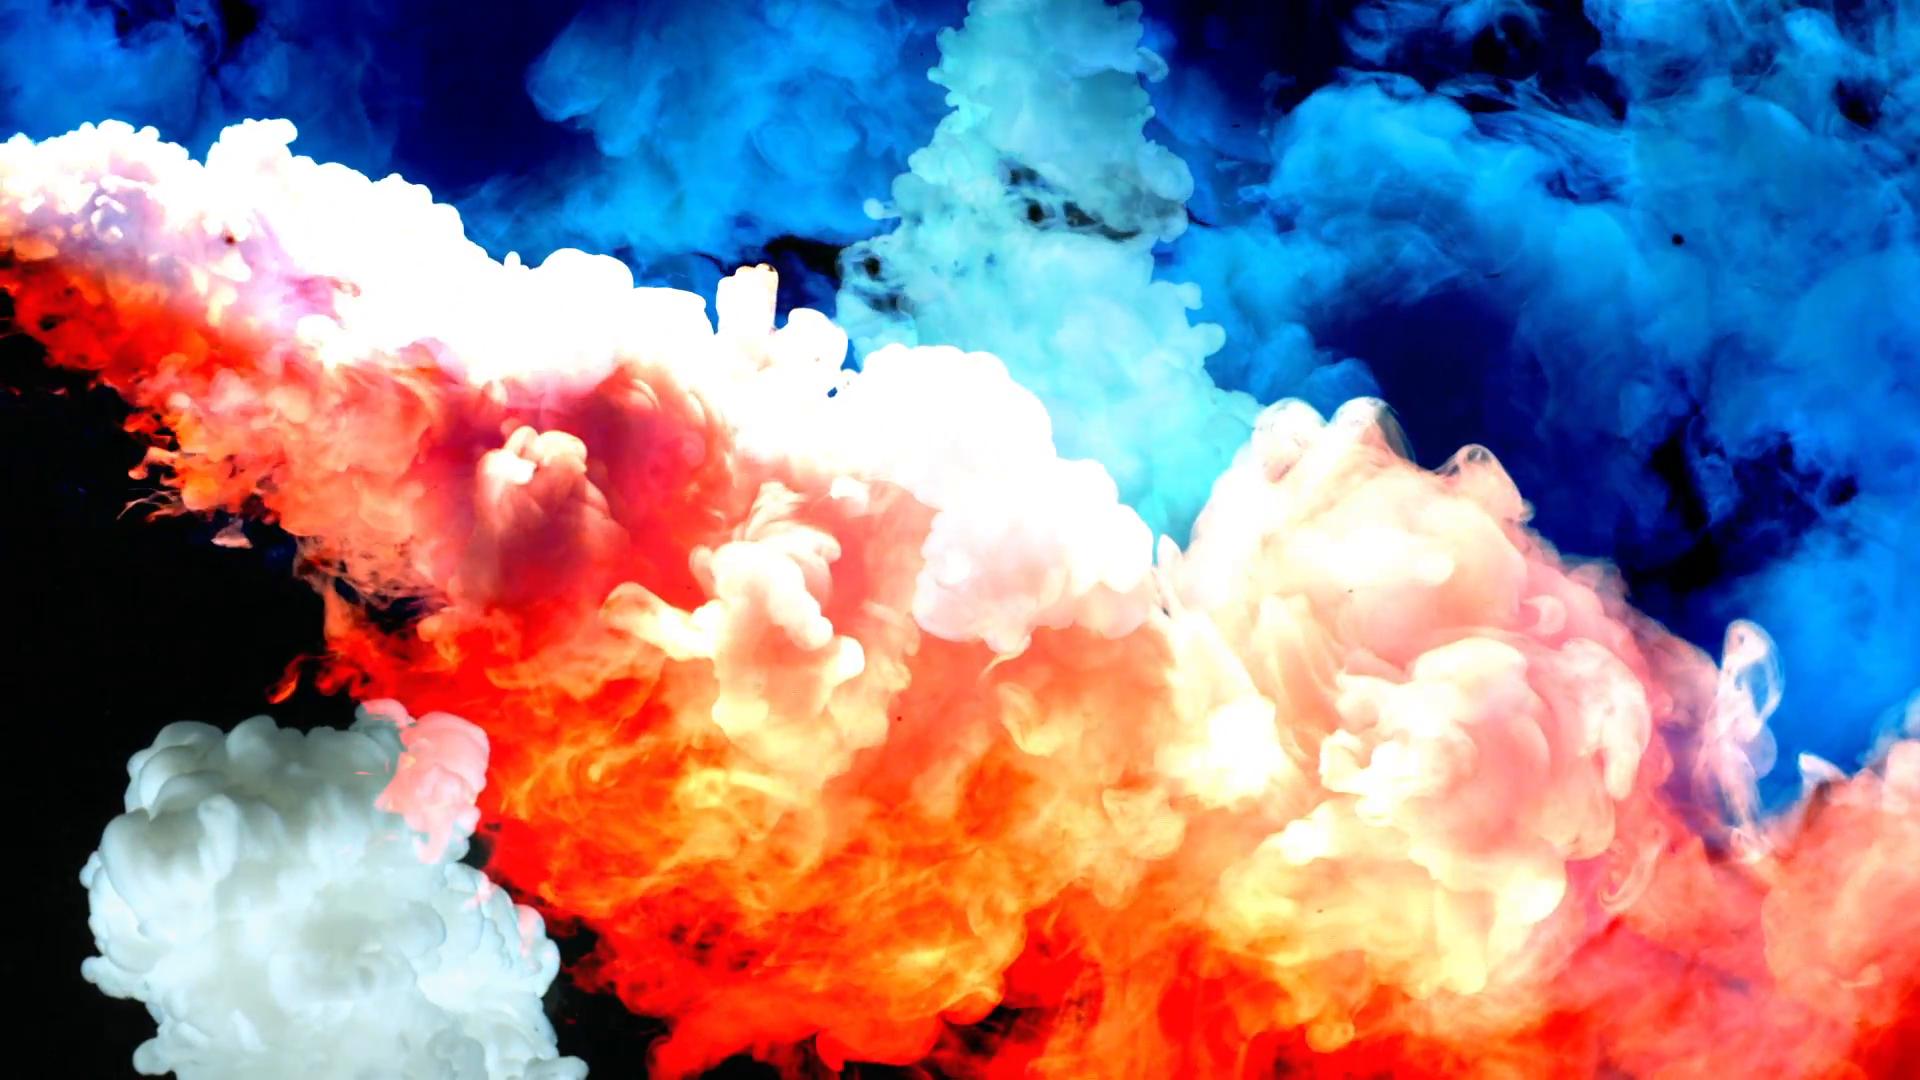 Multicolored dense Smoke effect Stock Video Footage - Videoblocks